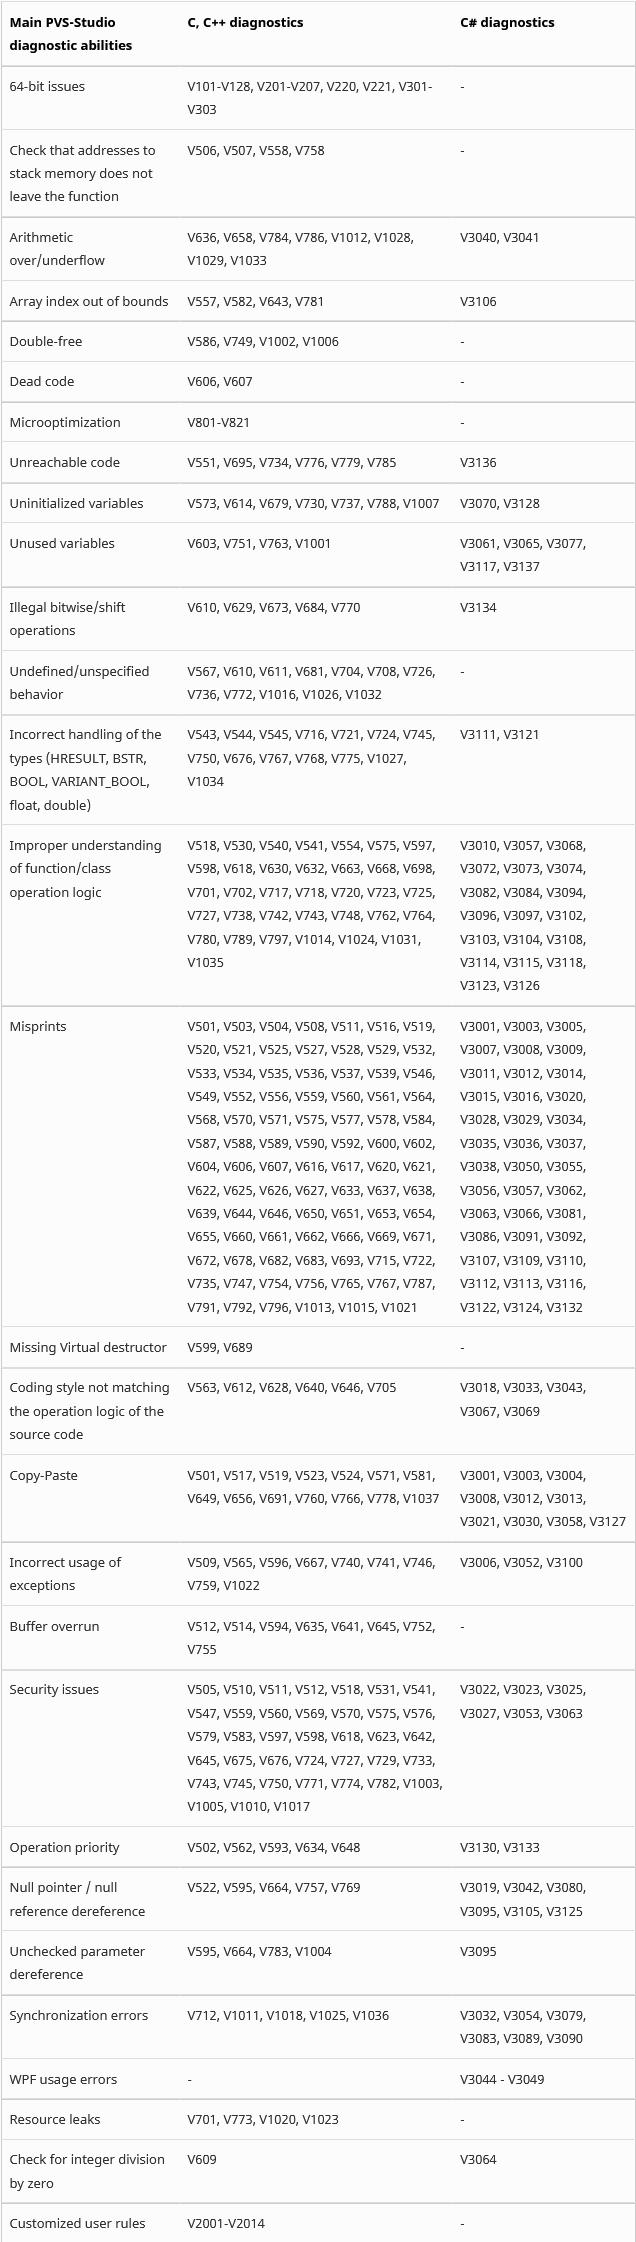 https://import.viva64.com/docx/blog/0635_PVS-Studio-for-Visual-Studio_2019/image13.png